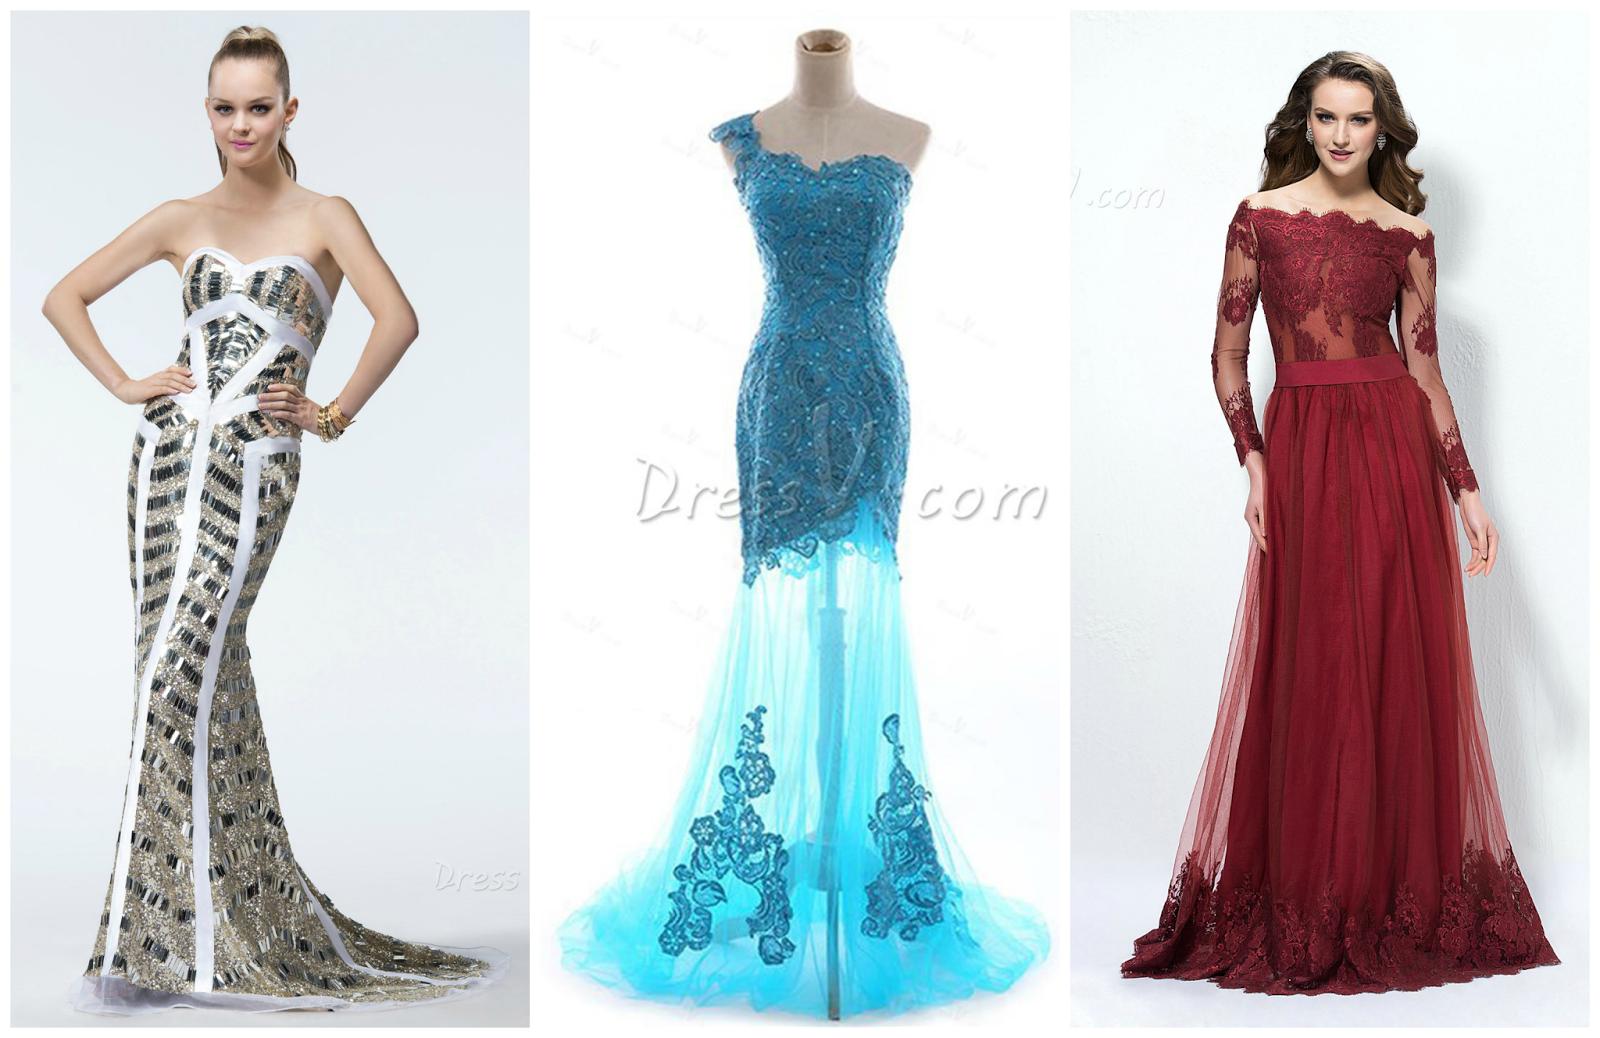 Sand Under My Feet: Discount Evening Dresses 2014 By DressV